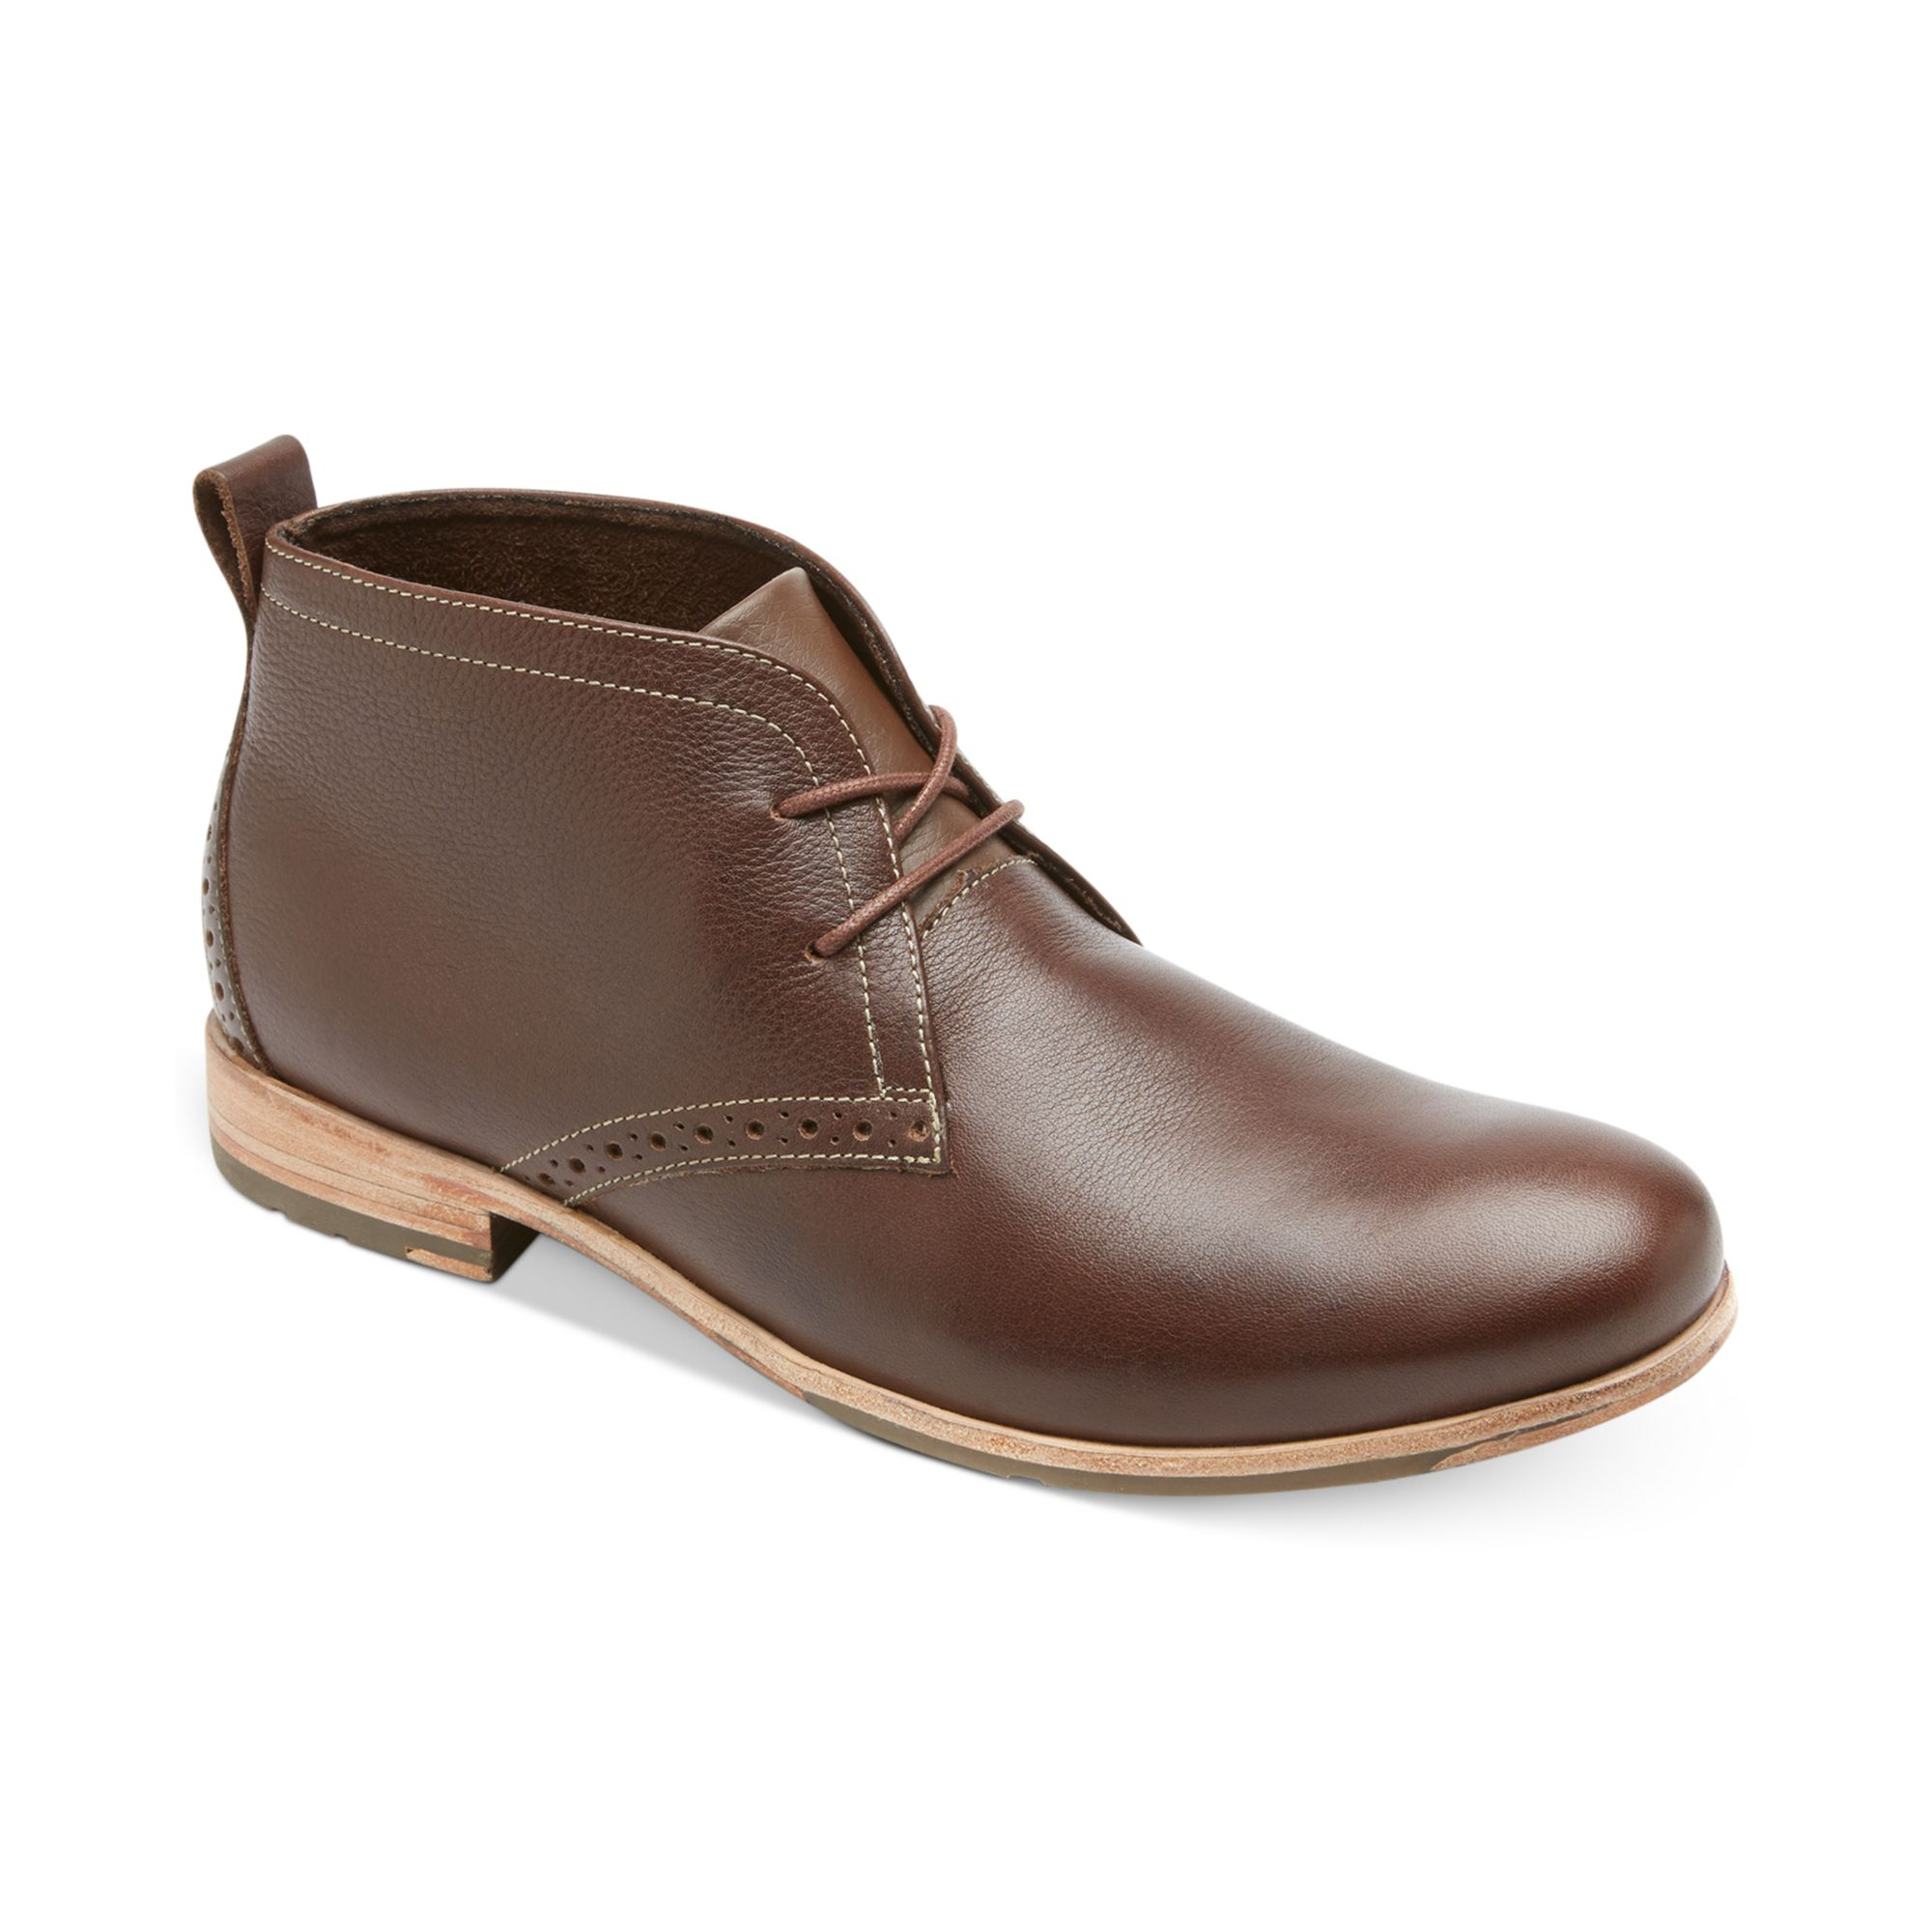 rockport castleton desert boots in brown for rum